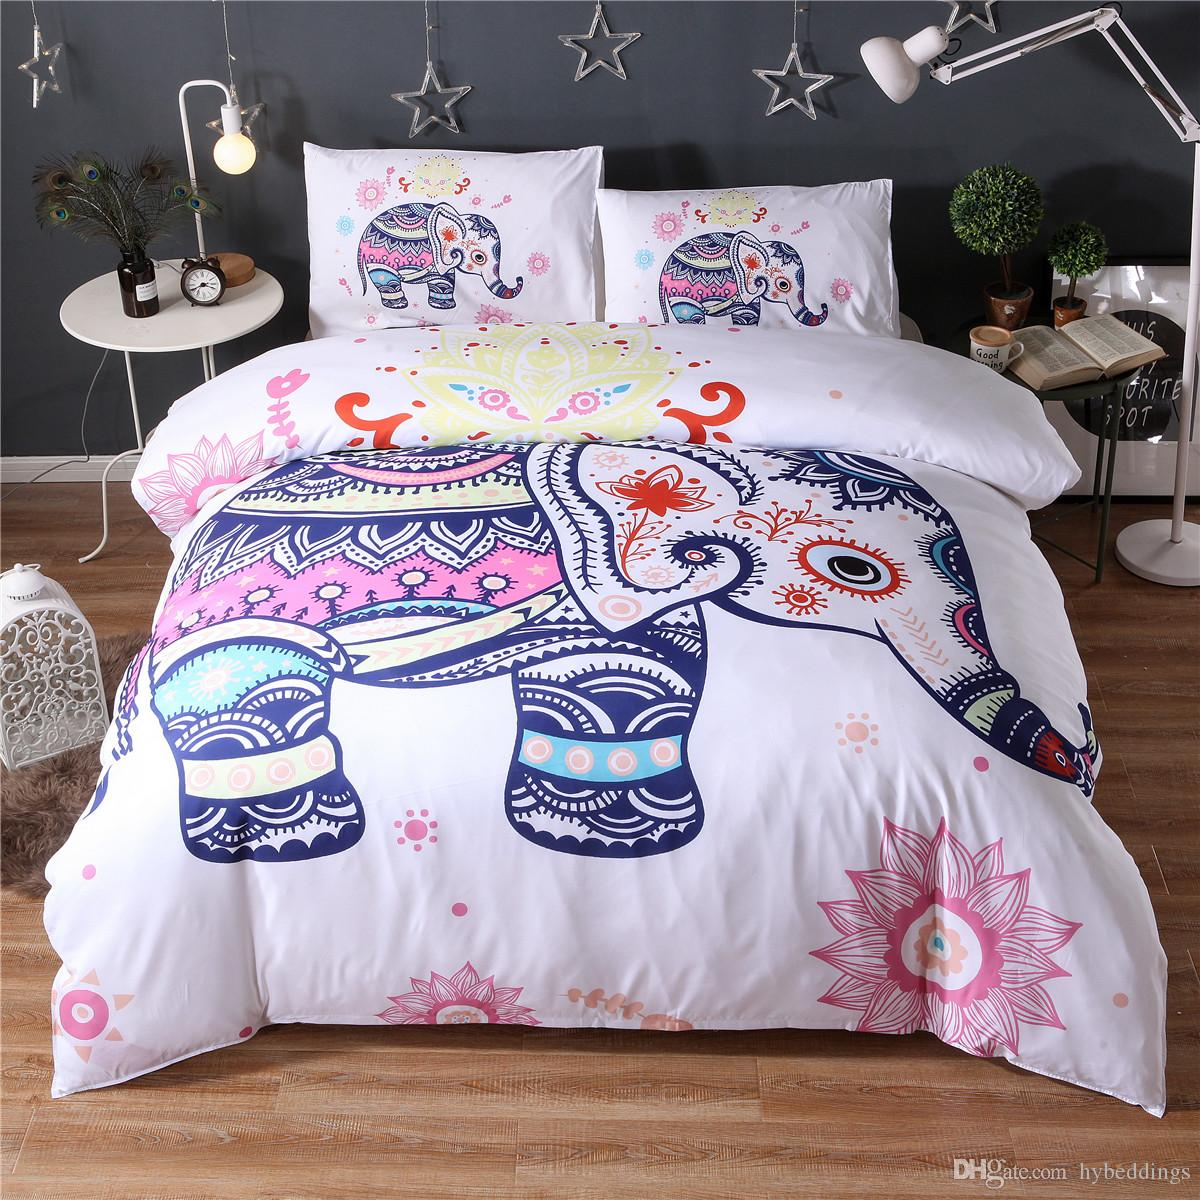 Small Cute Cartoon Elephant Bedding Set White Duvet Quilt